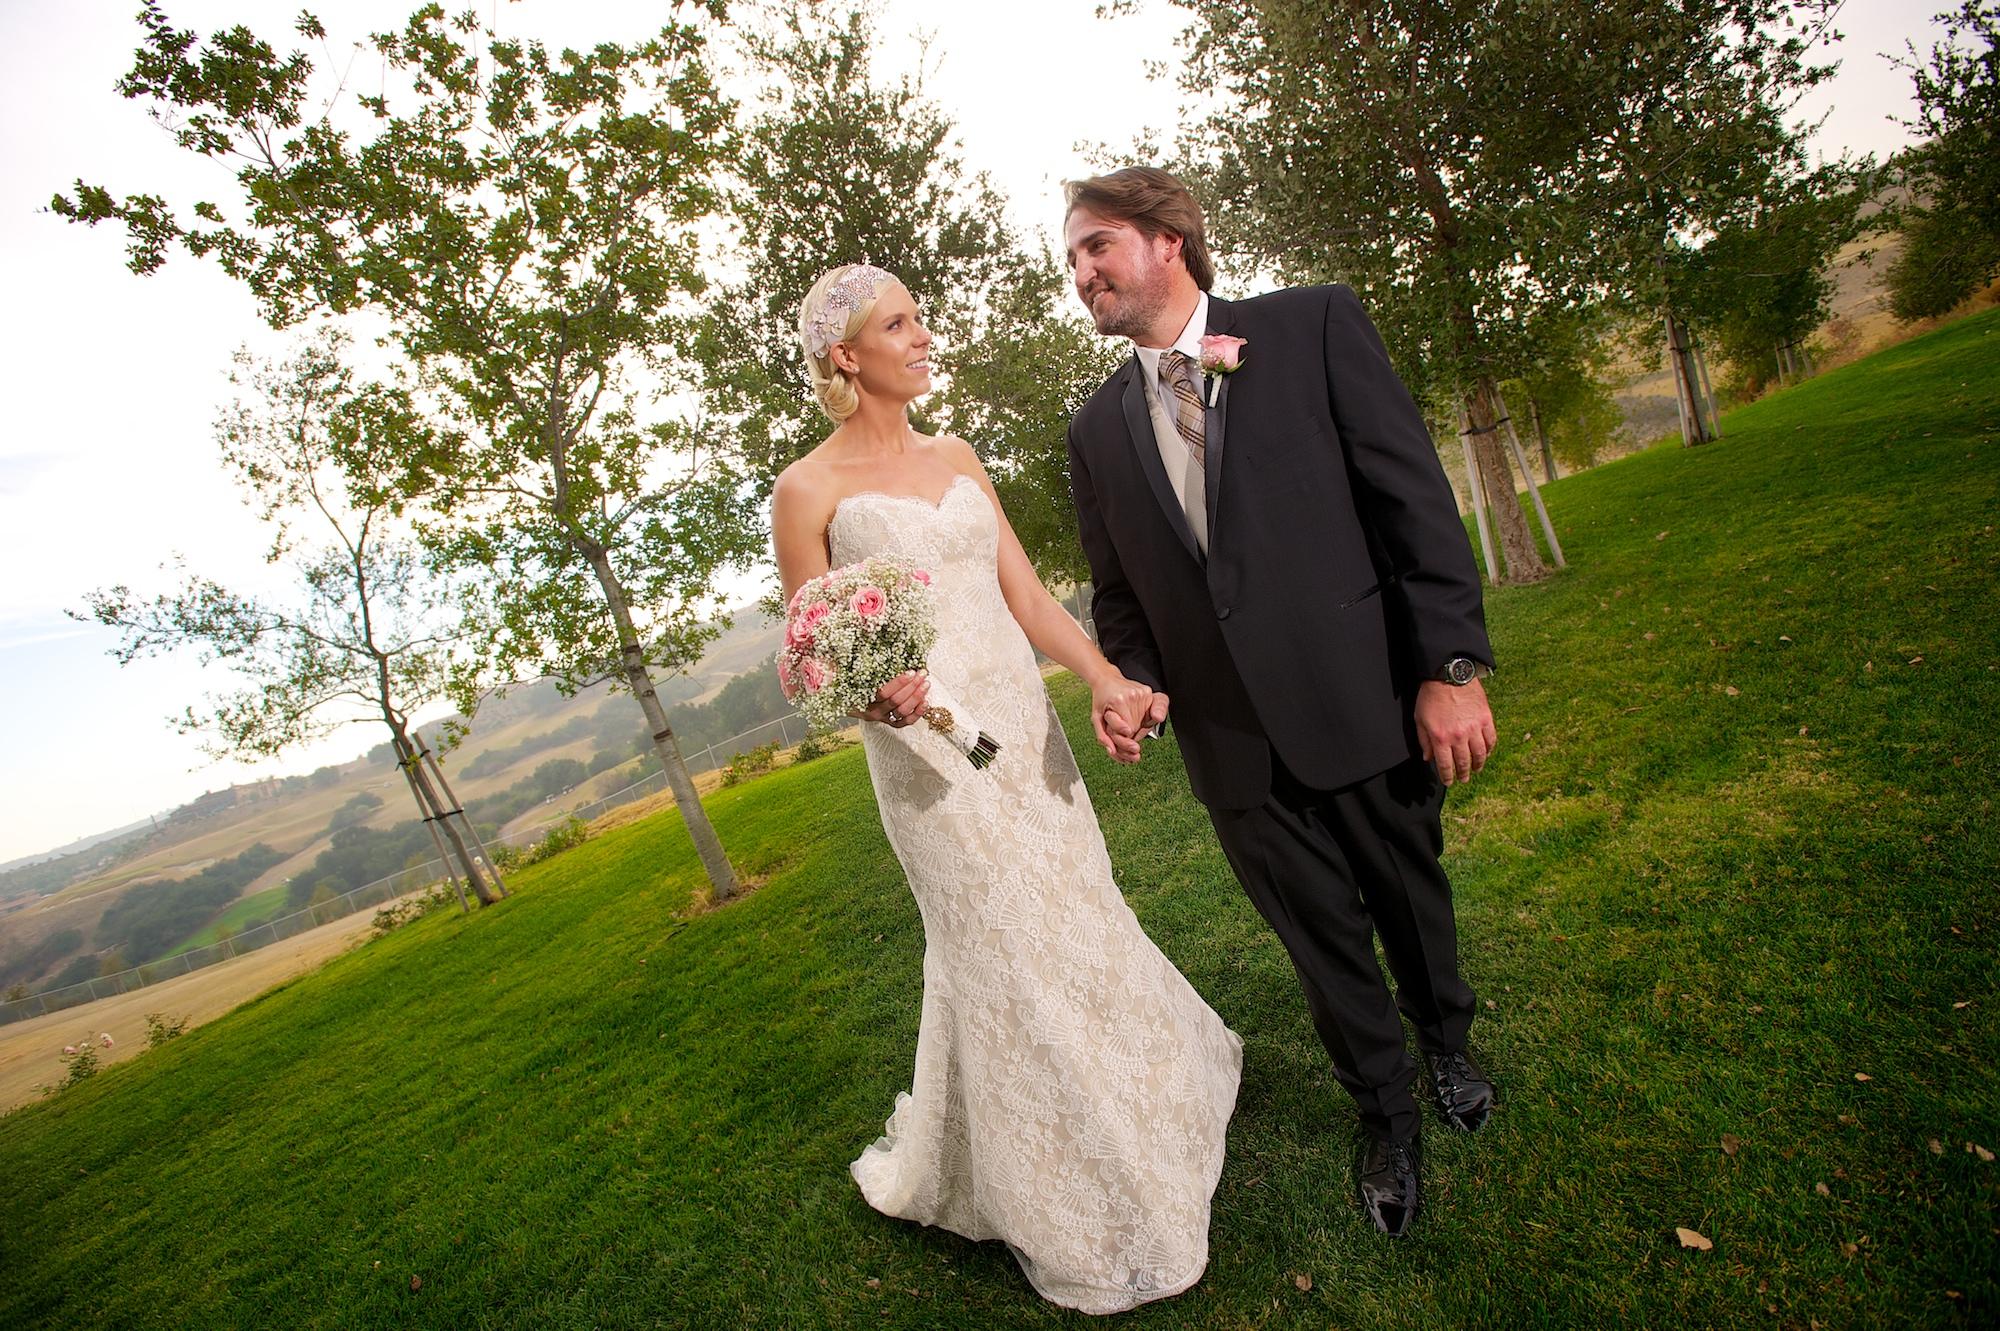 Blush Rose Wedding At Vellano Country Club Chino Hills